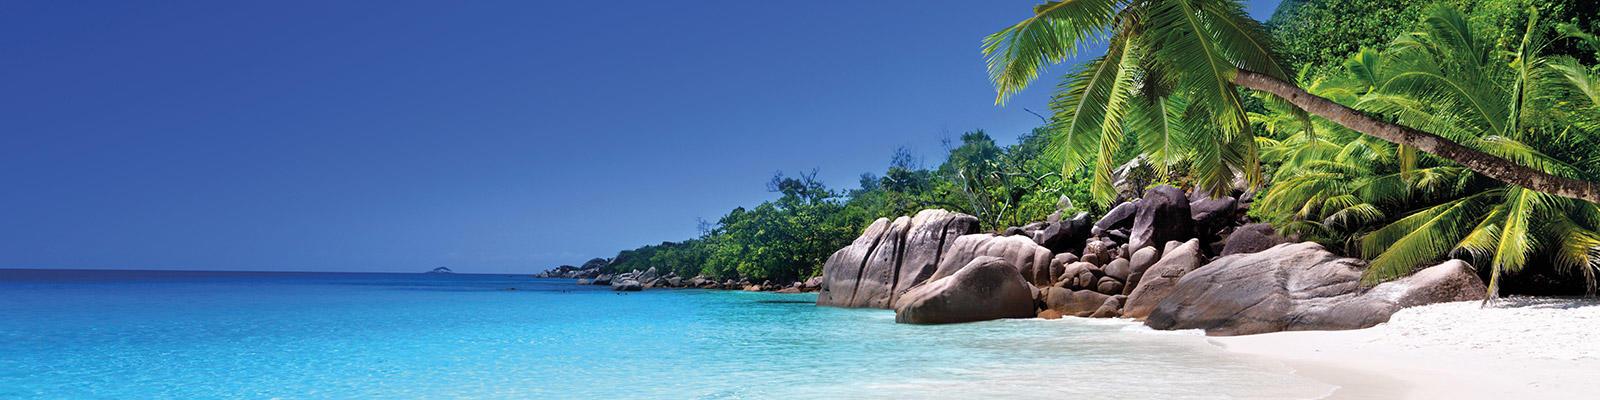 World's Best Islands